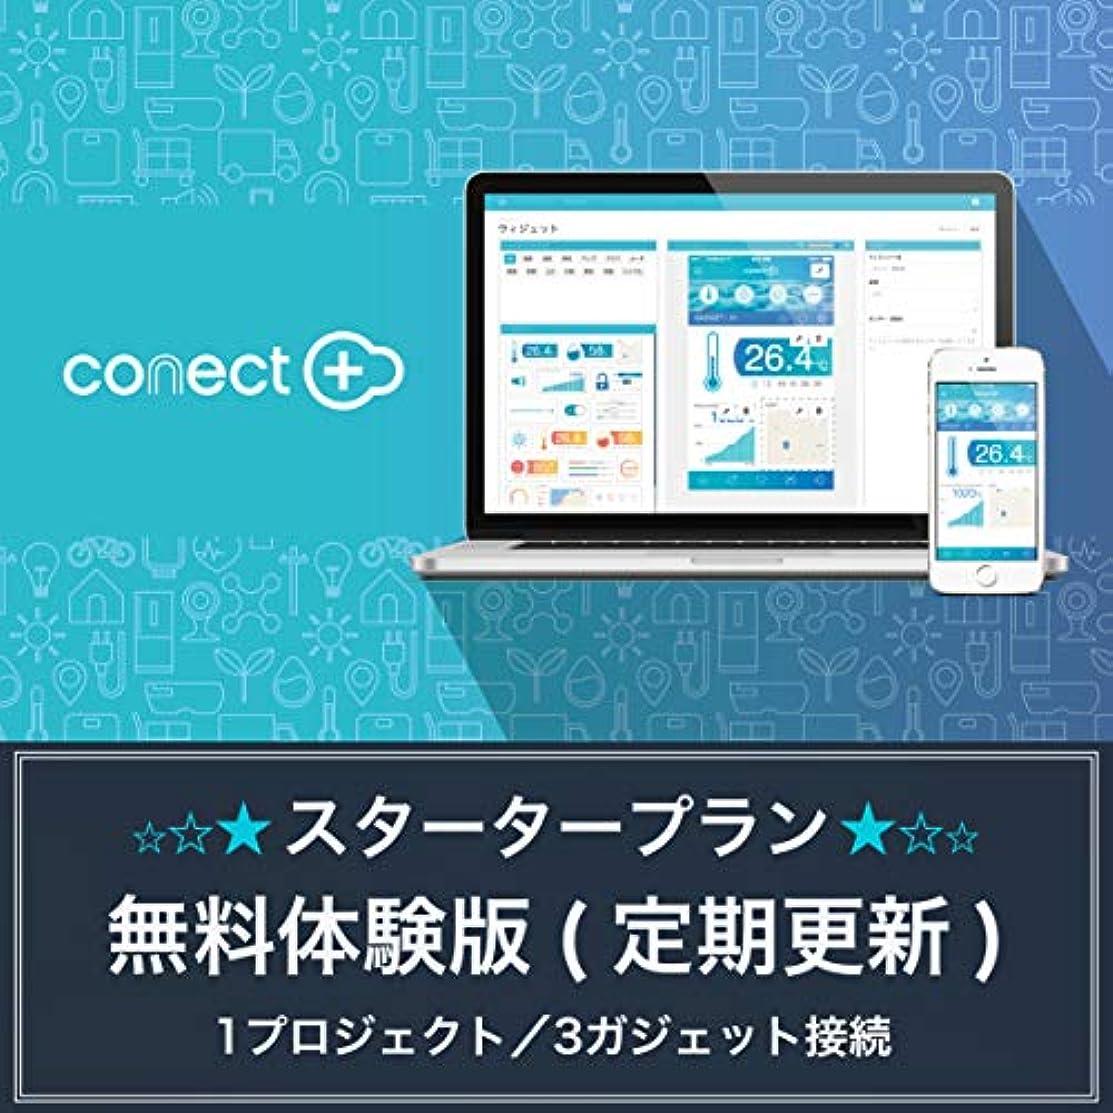 conect+ STARTER PLAN   30日無料体験版   1プロジェクト/3ガジェット接続   サブスクリプション(定期更新)